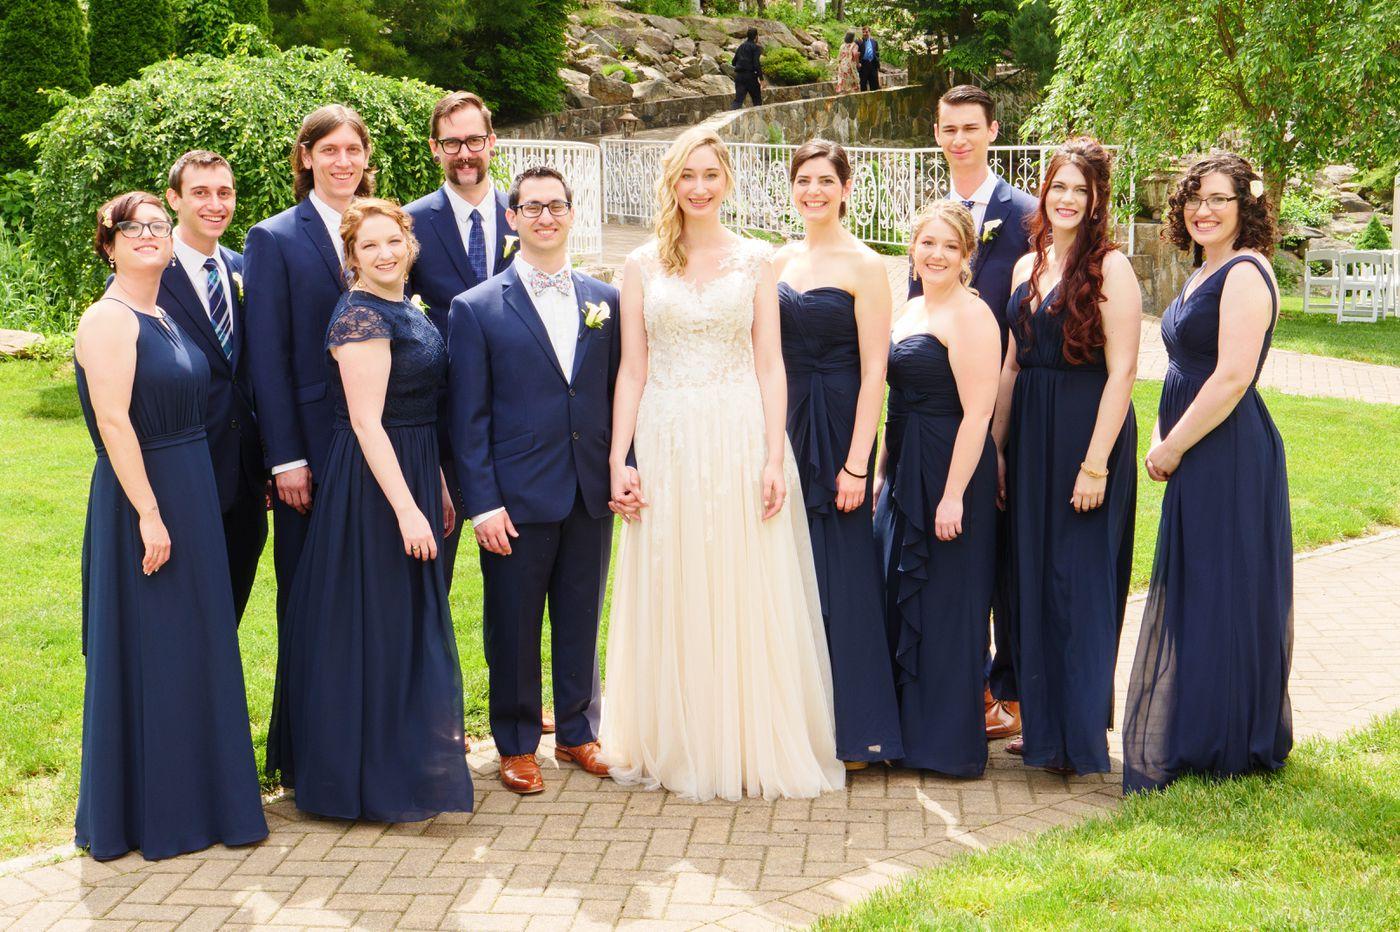 Philadelphia weddings: Moriah Benjoseph and Ben Nassau